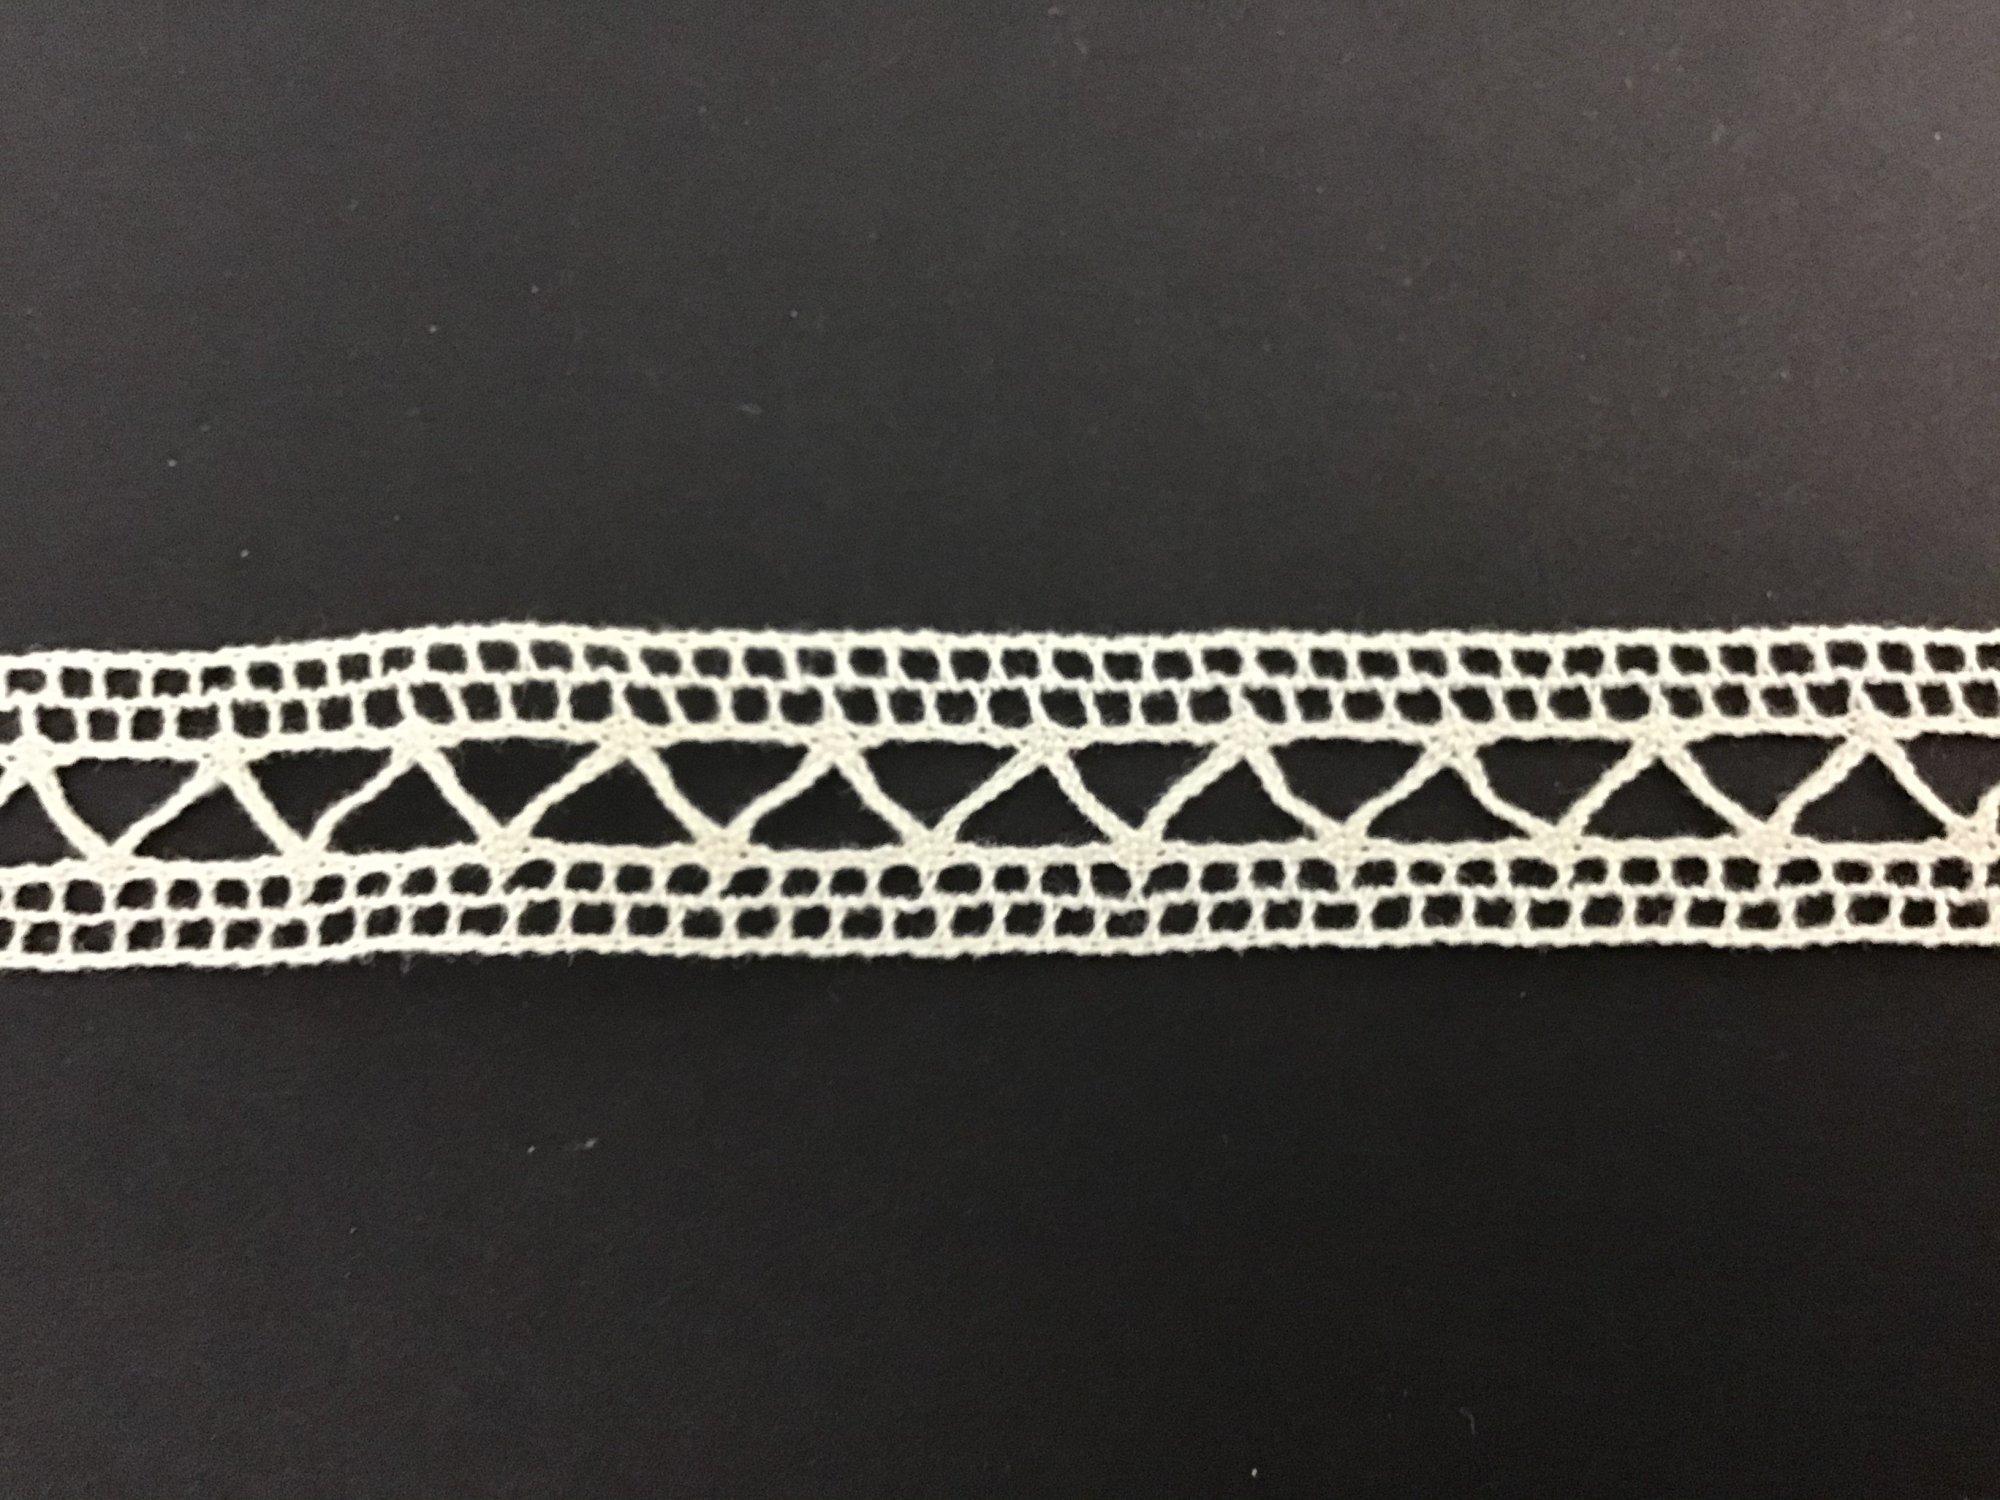 French Cluney Lace Insertion 5/8 Inch Ecru 1205-12